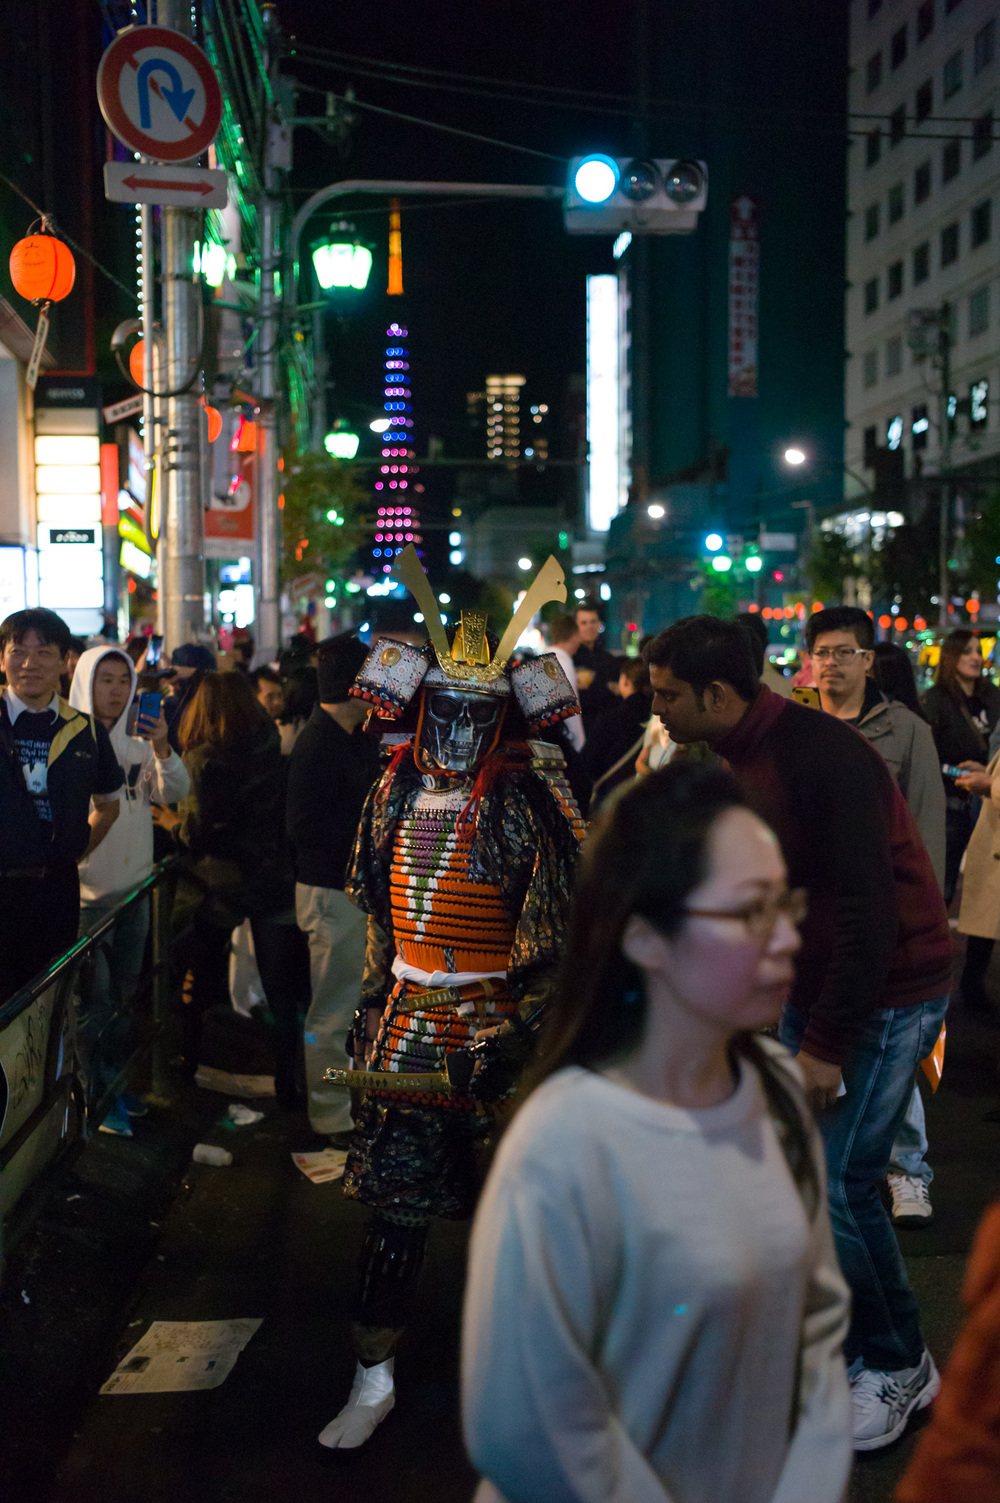 Roppongi Halloween, Tokyo, Japan Leica M-E Leica Summicron 35/2 ASPH